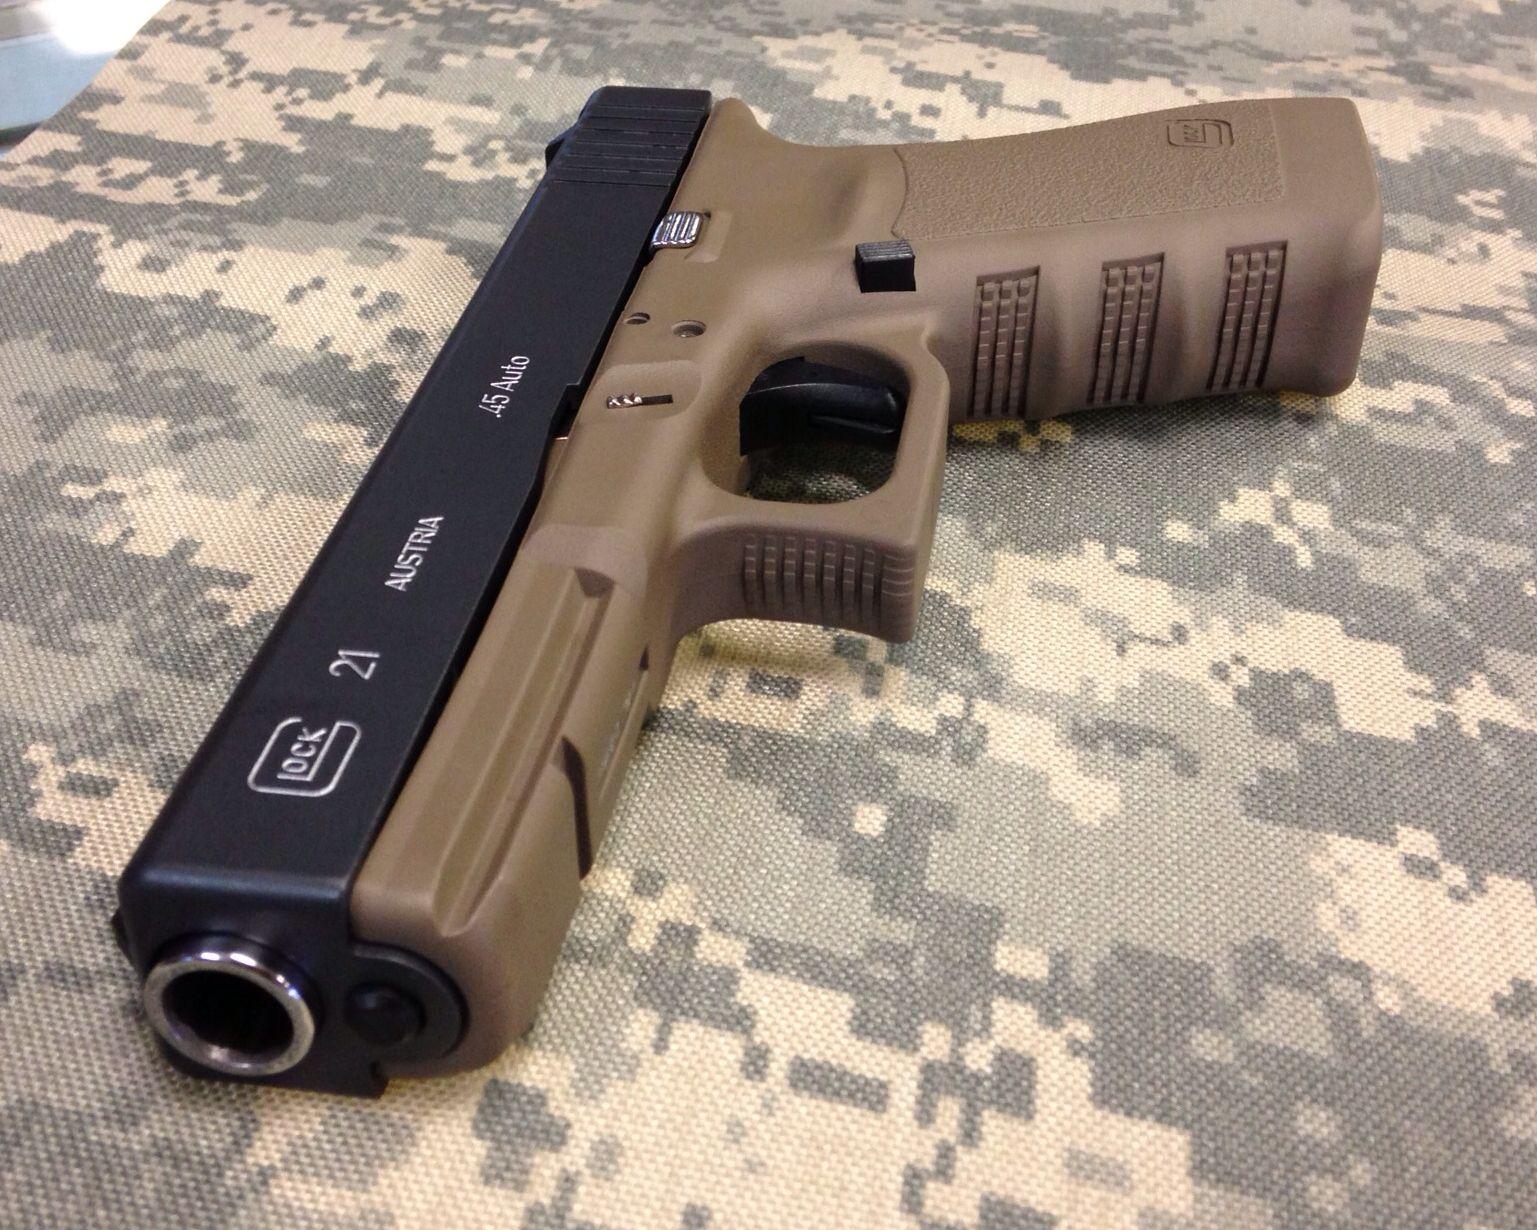 Glock 21 cerakoted Sniper Grey and FDE.